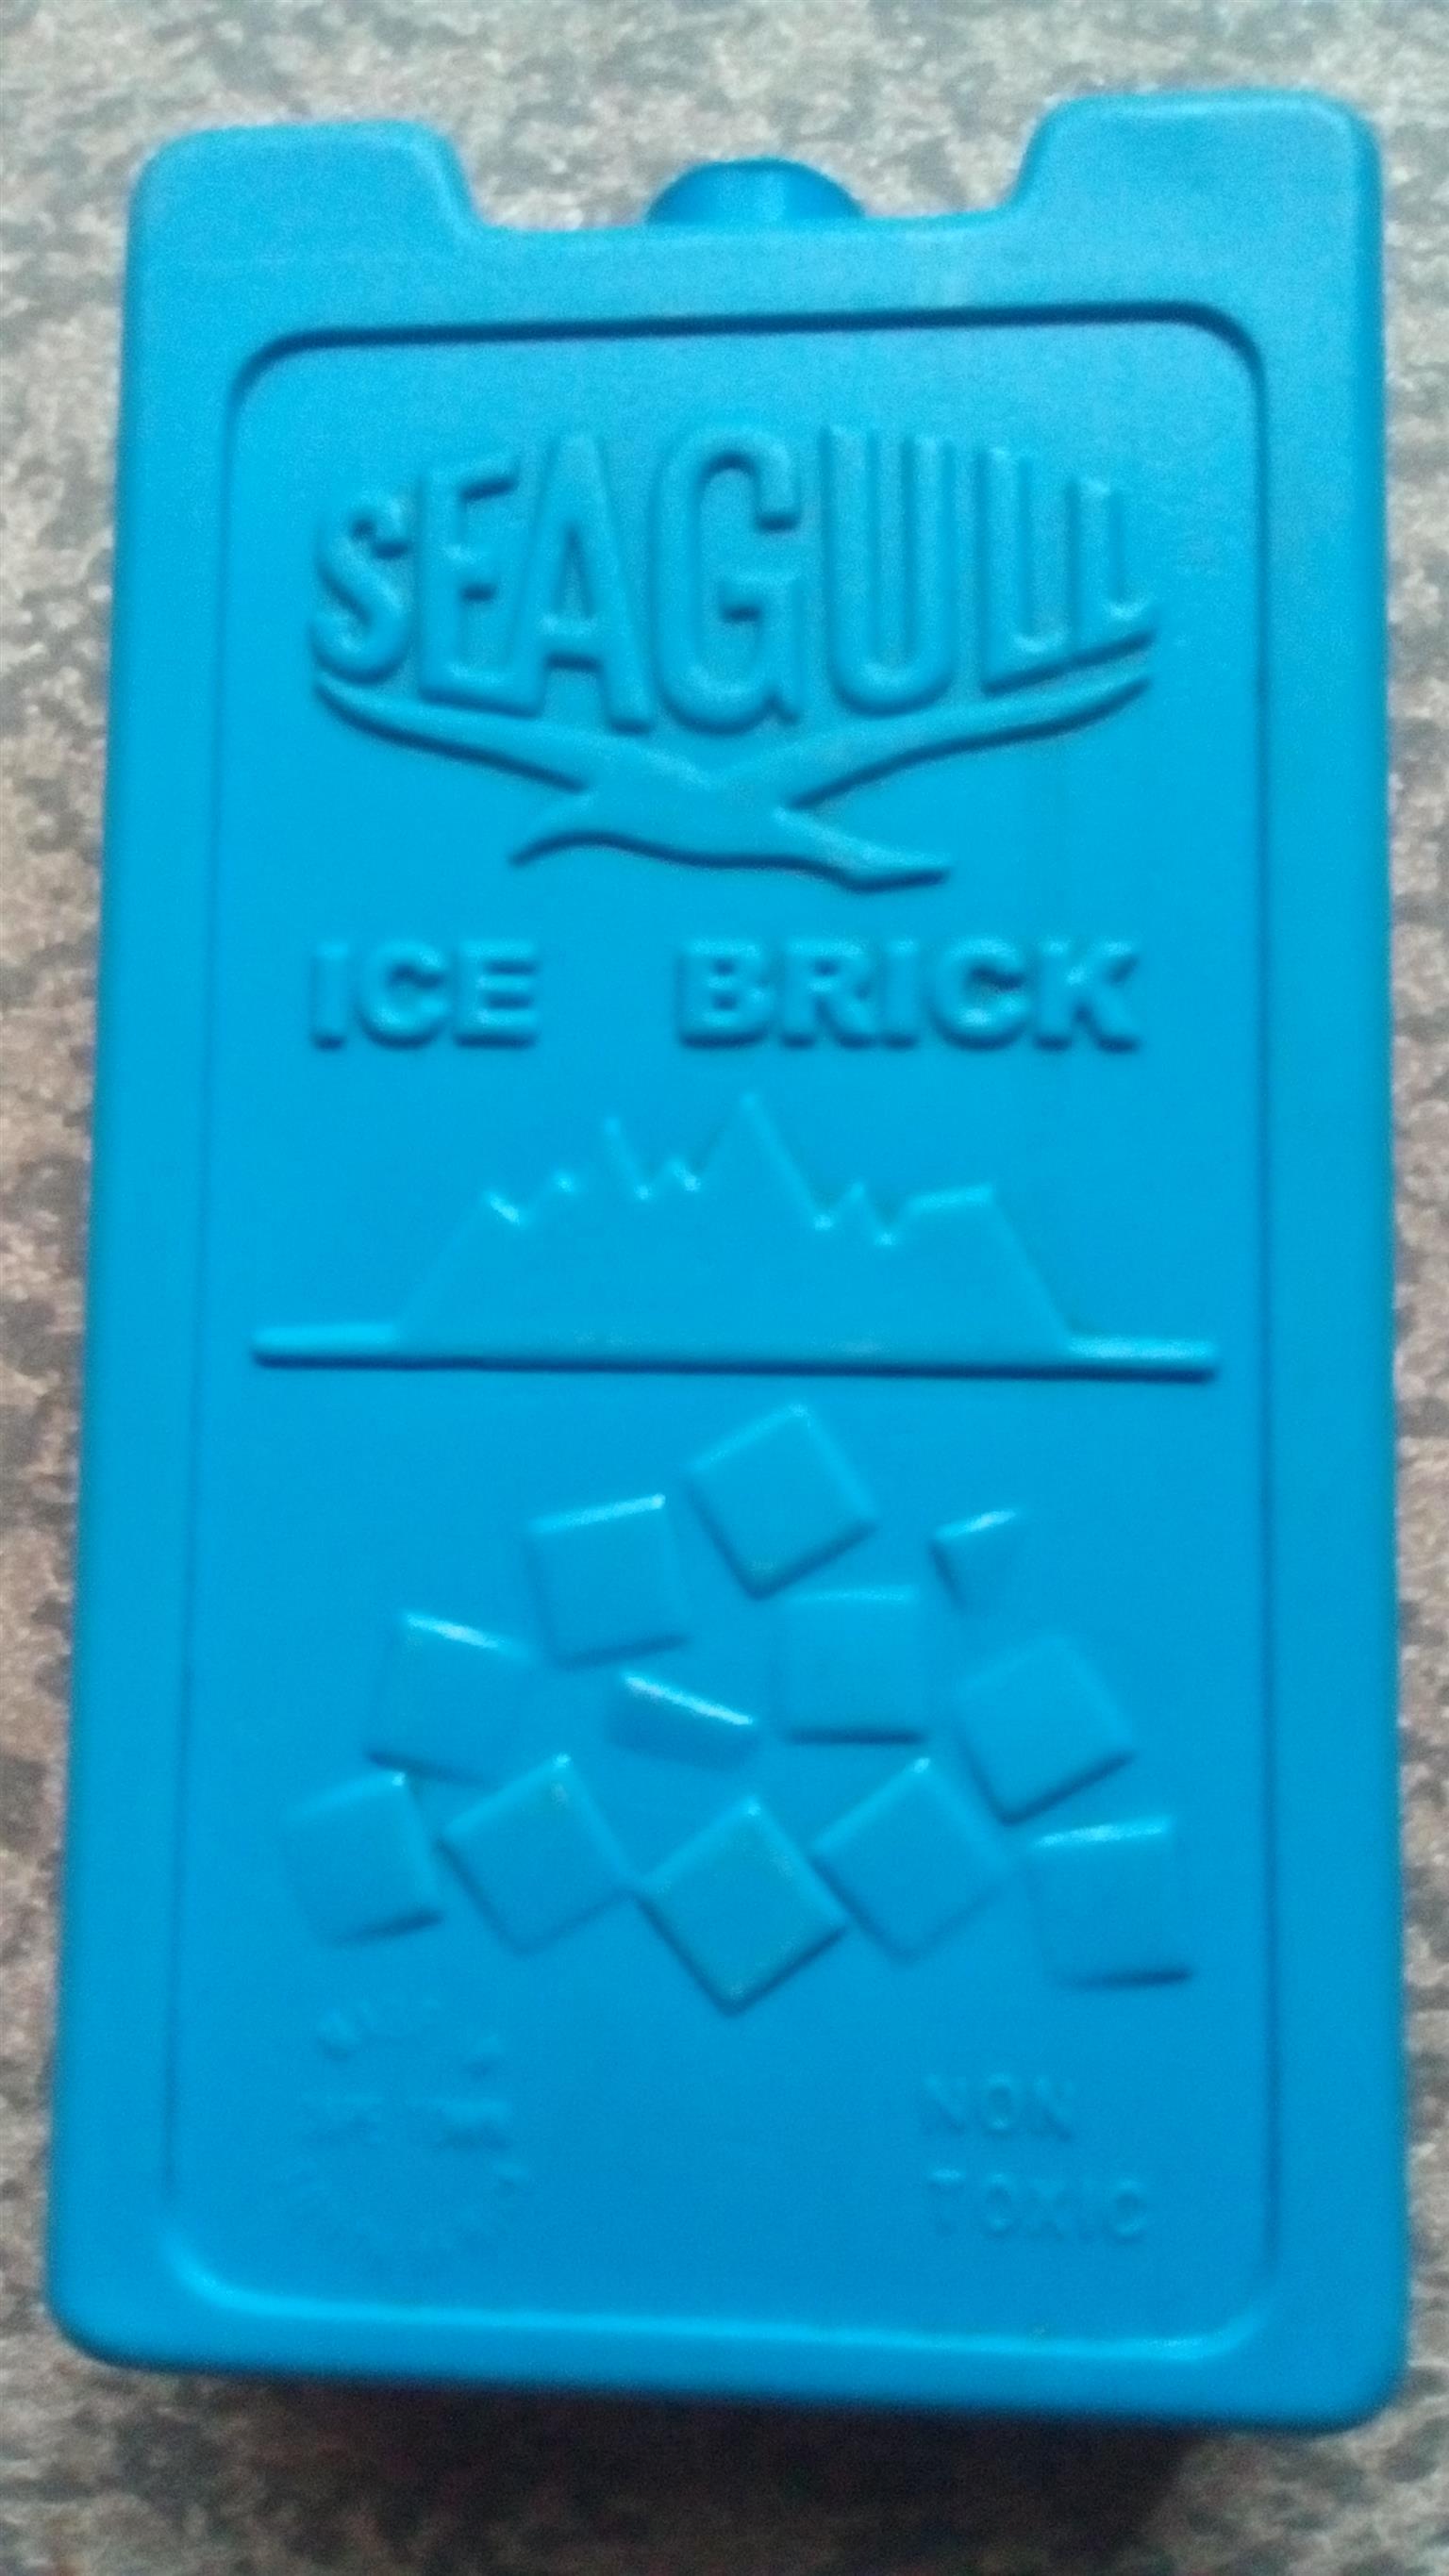 Seagull ice brick x 8